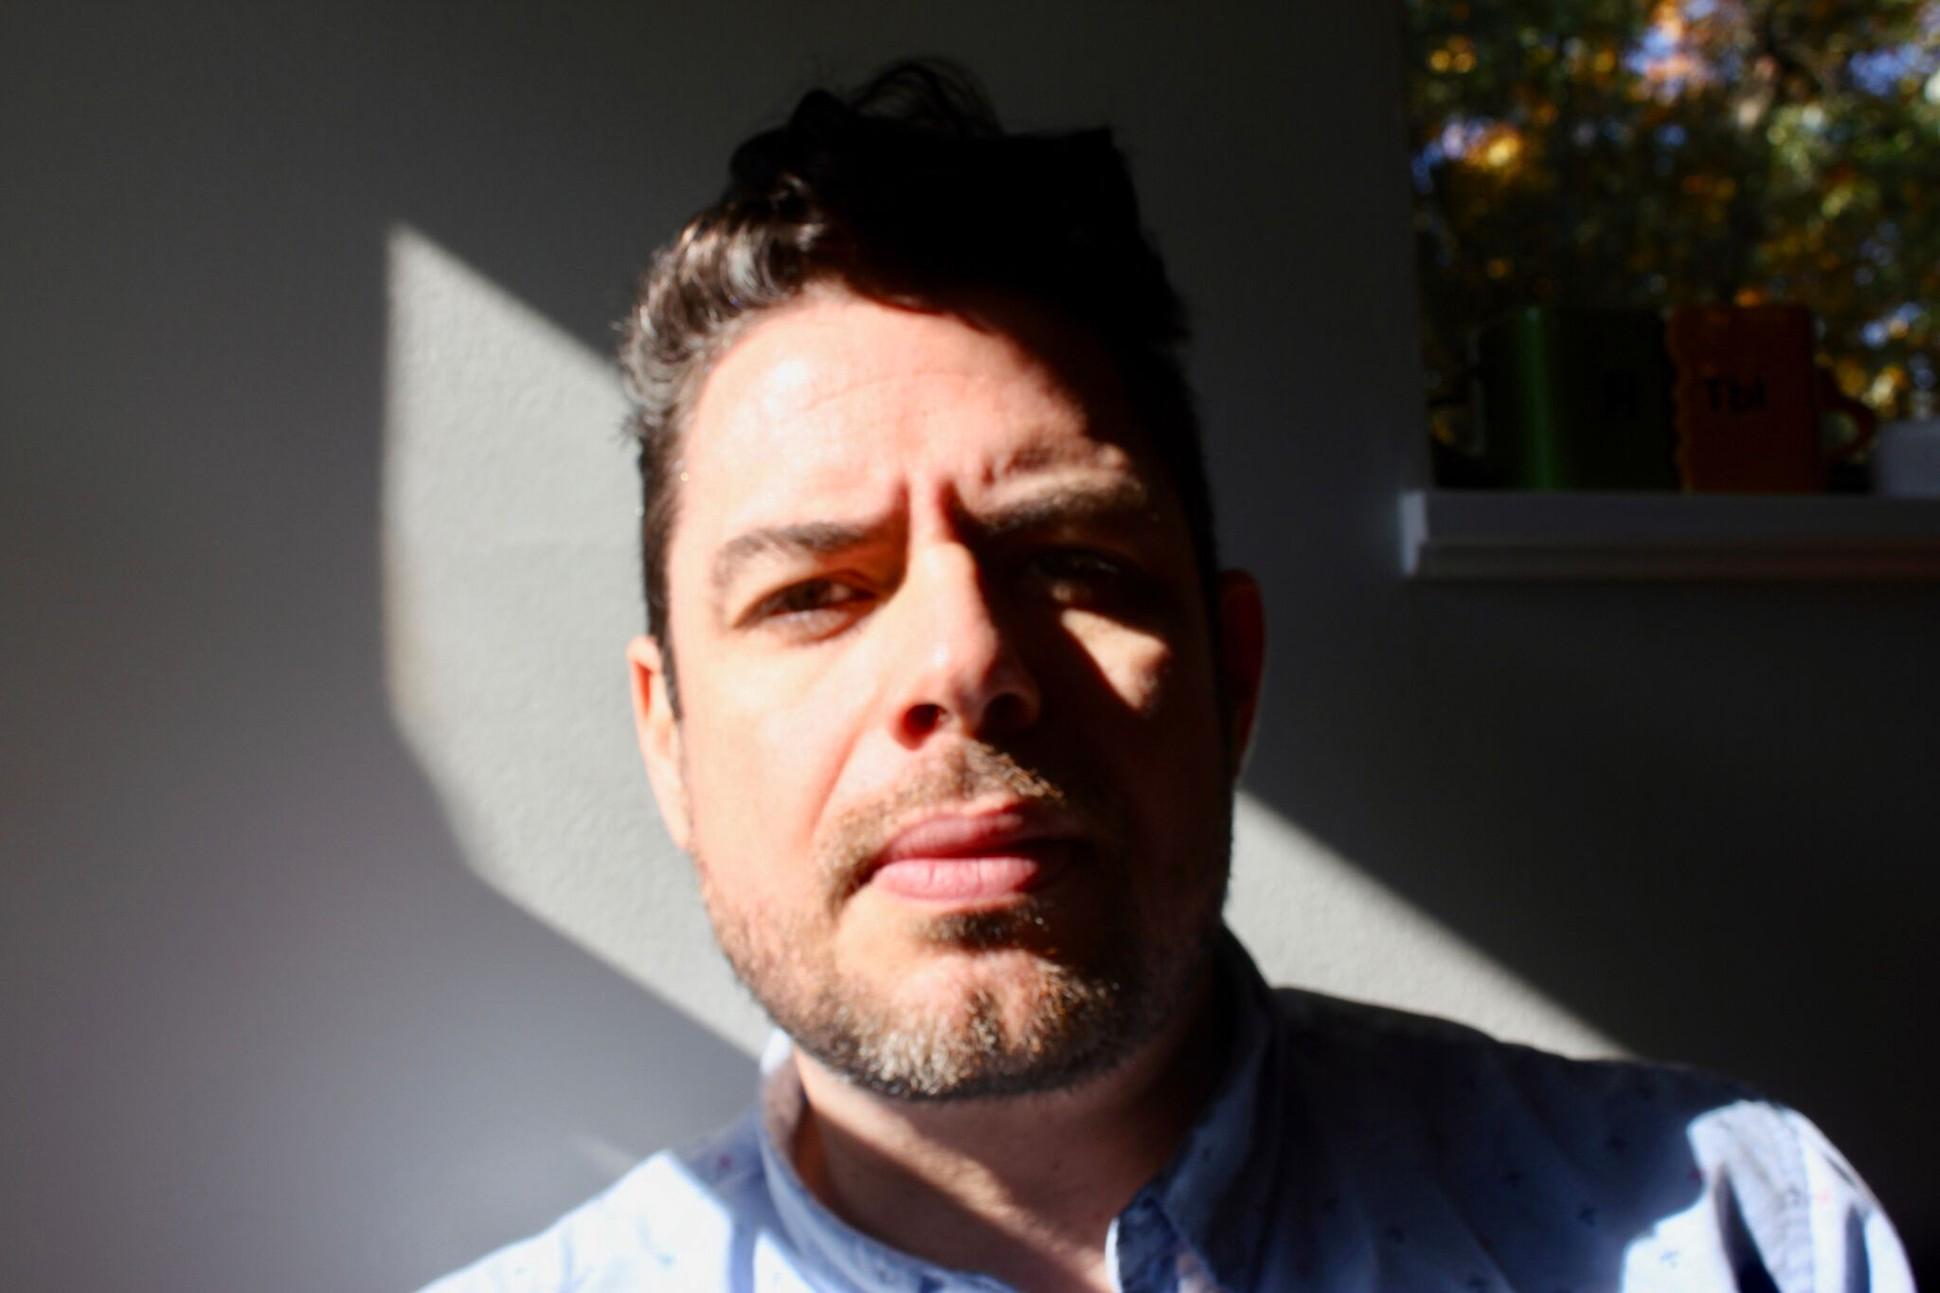 Image of Jacob Shores Arguello